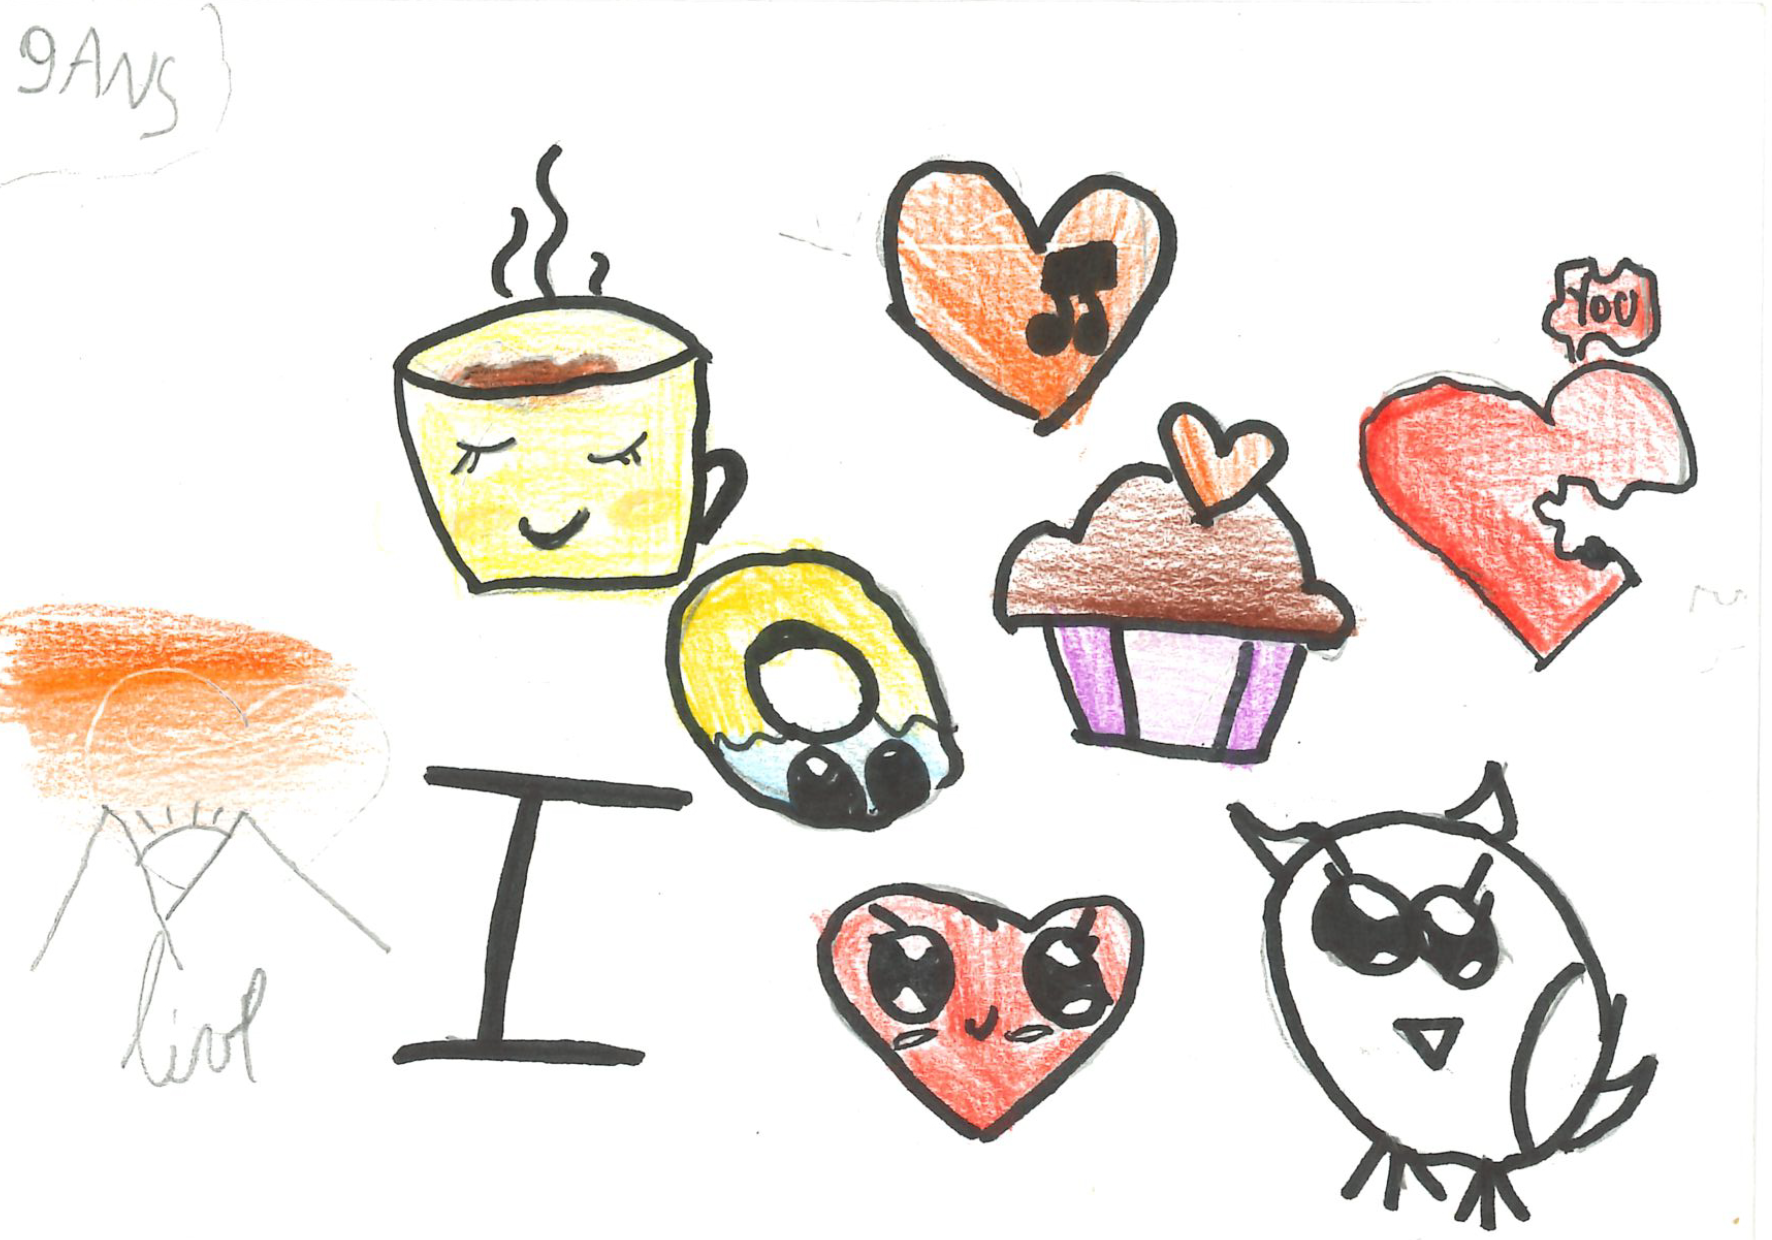 Un dessin d'un enfant de 9 ans